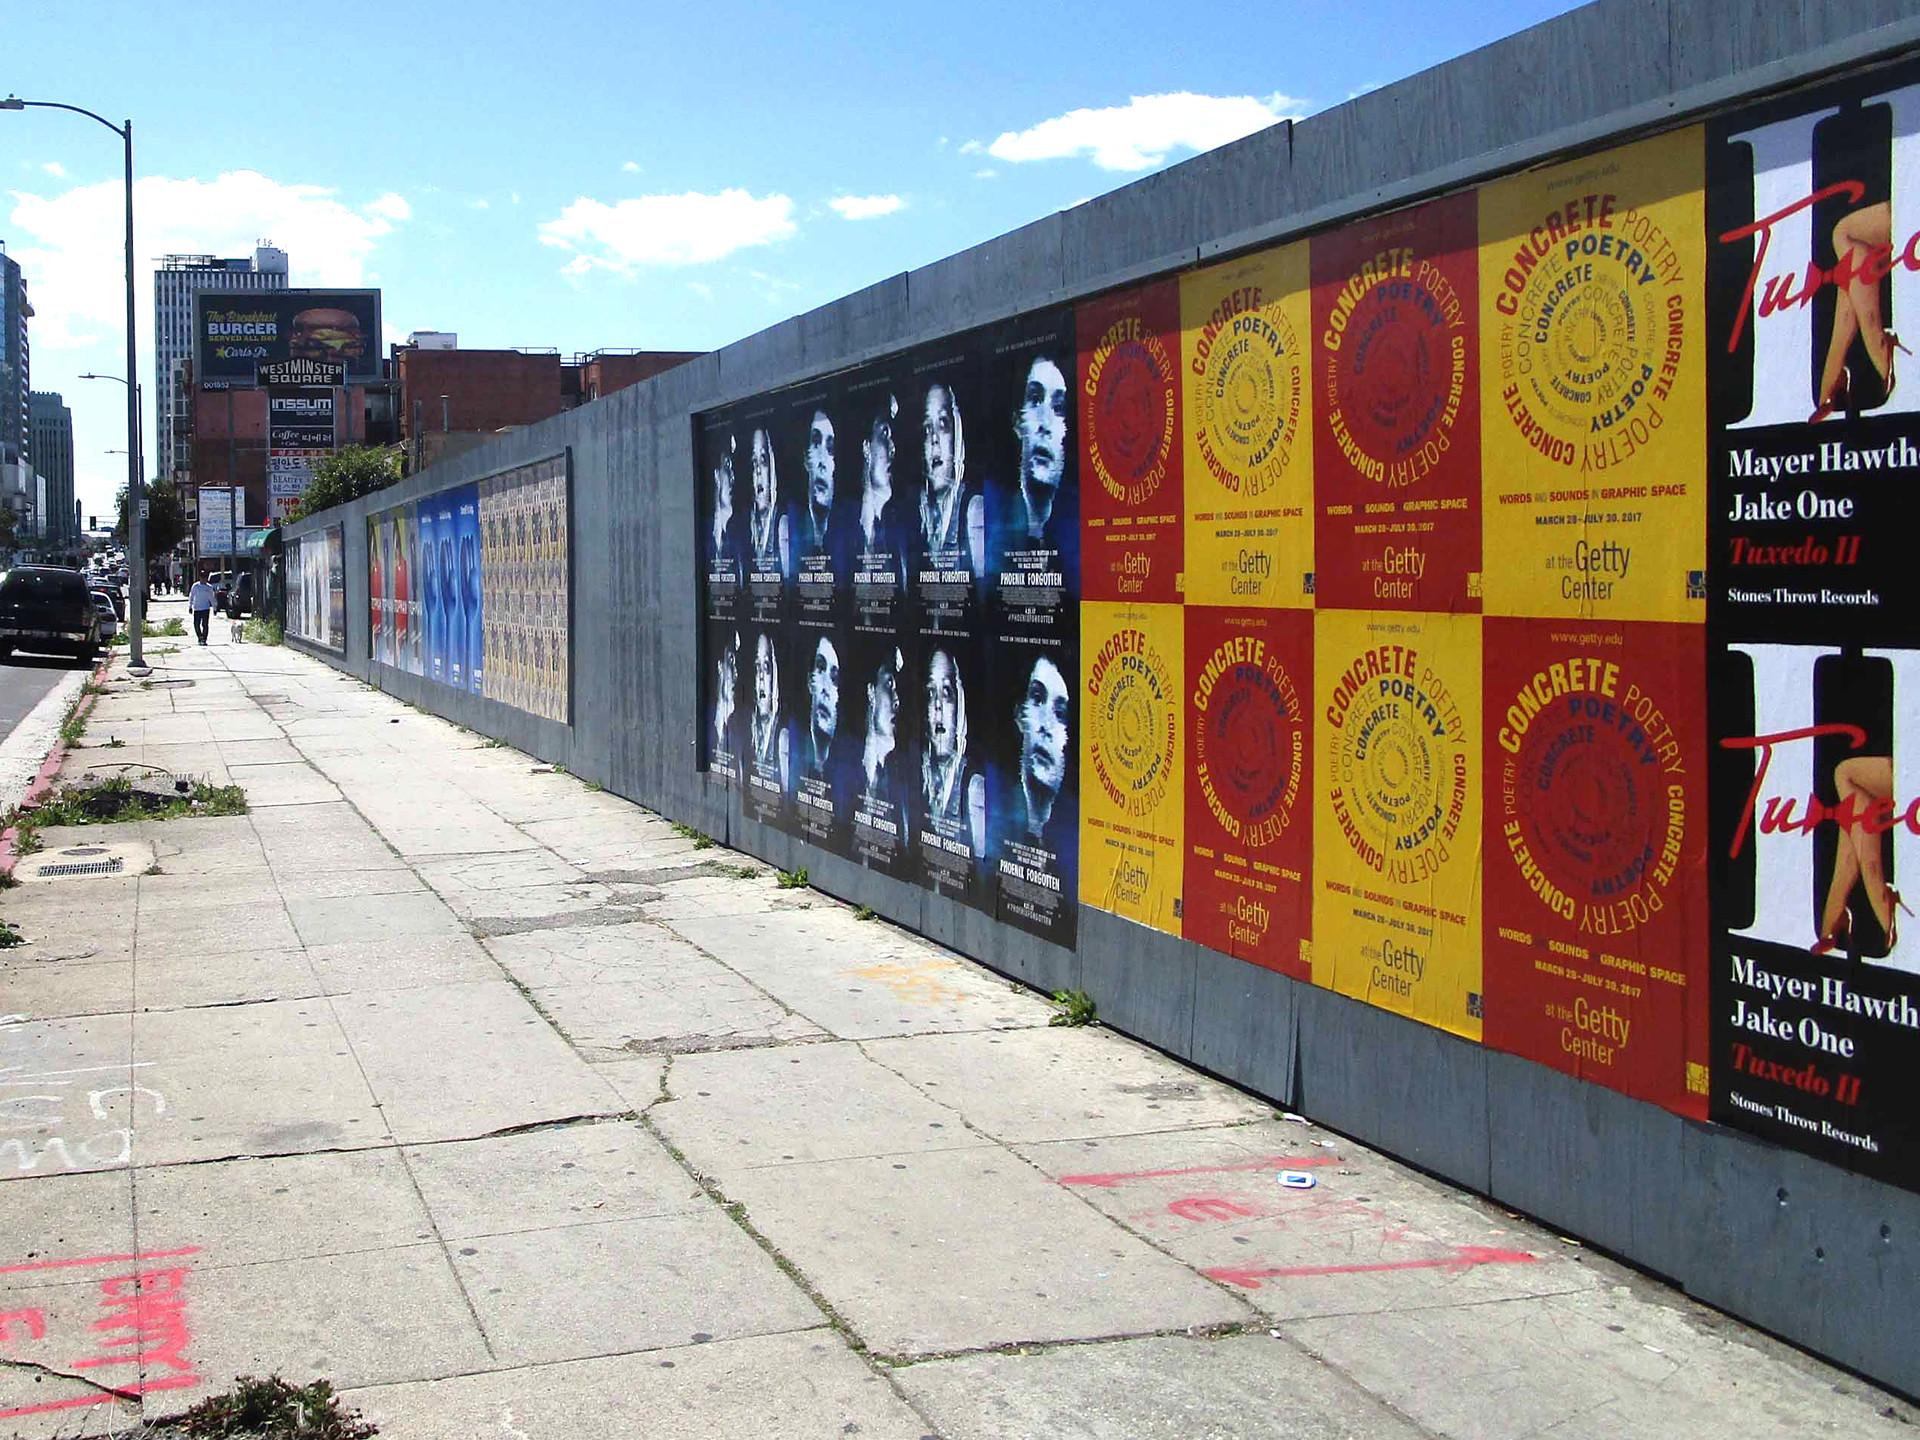 Wild postings promoting the exhibition around Los Angeles.